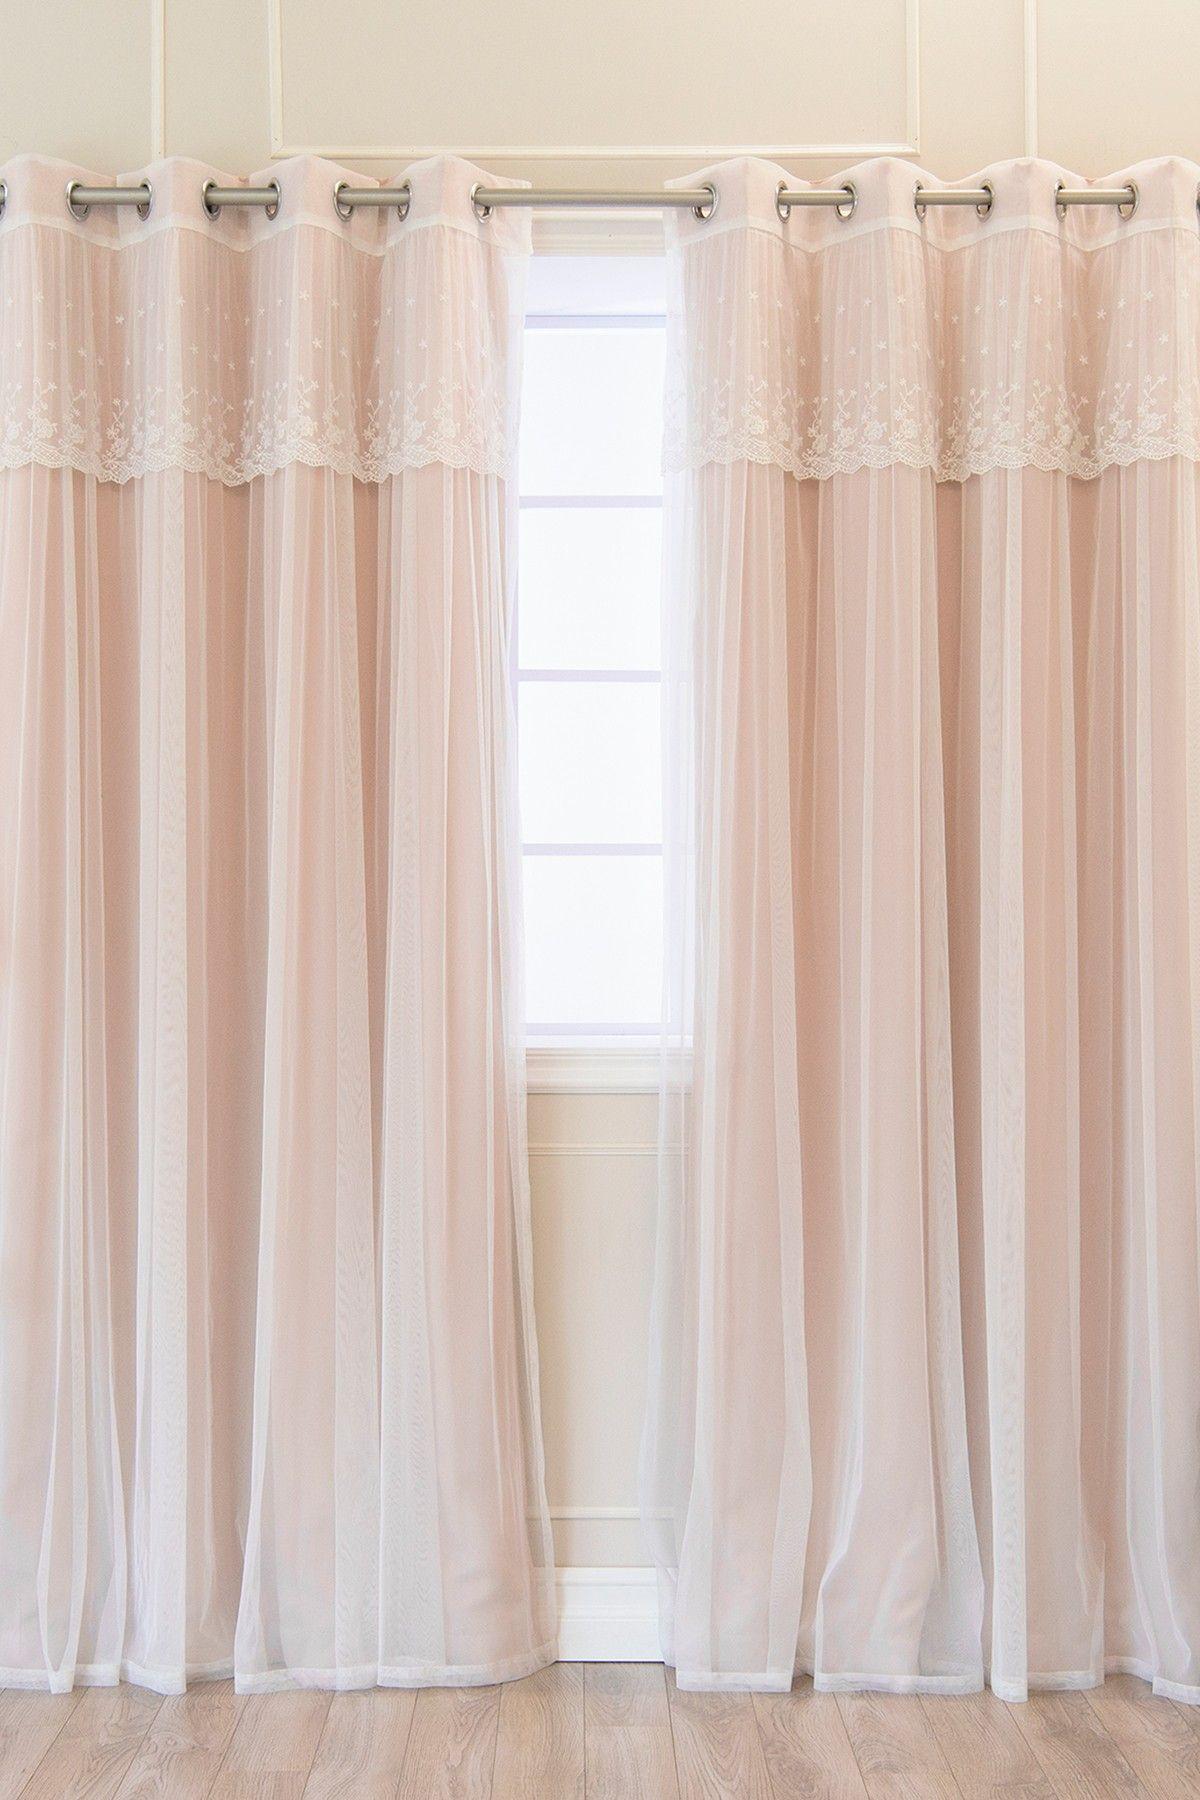 Best Home Fashion Inc Dusty Pink Mix Match Dimanche Lace